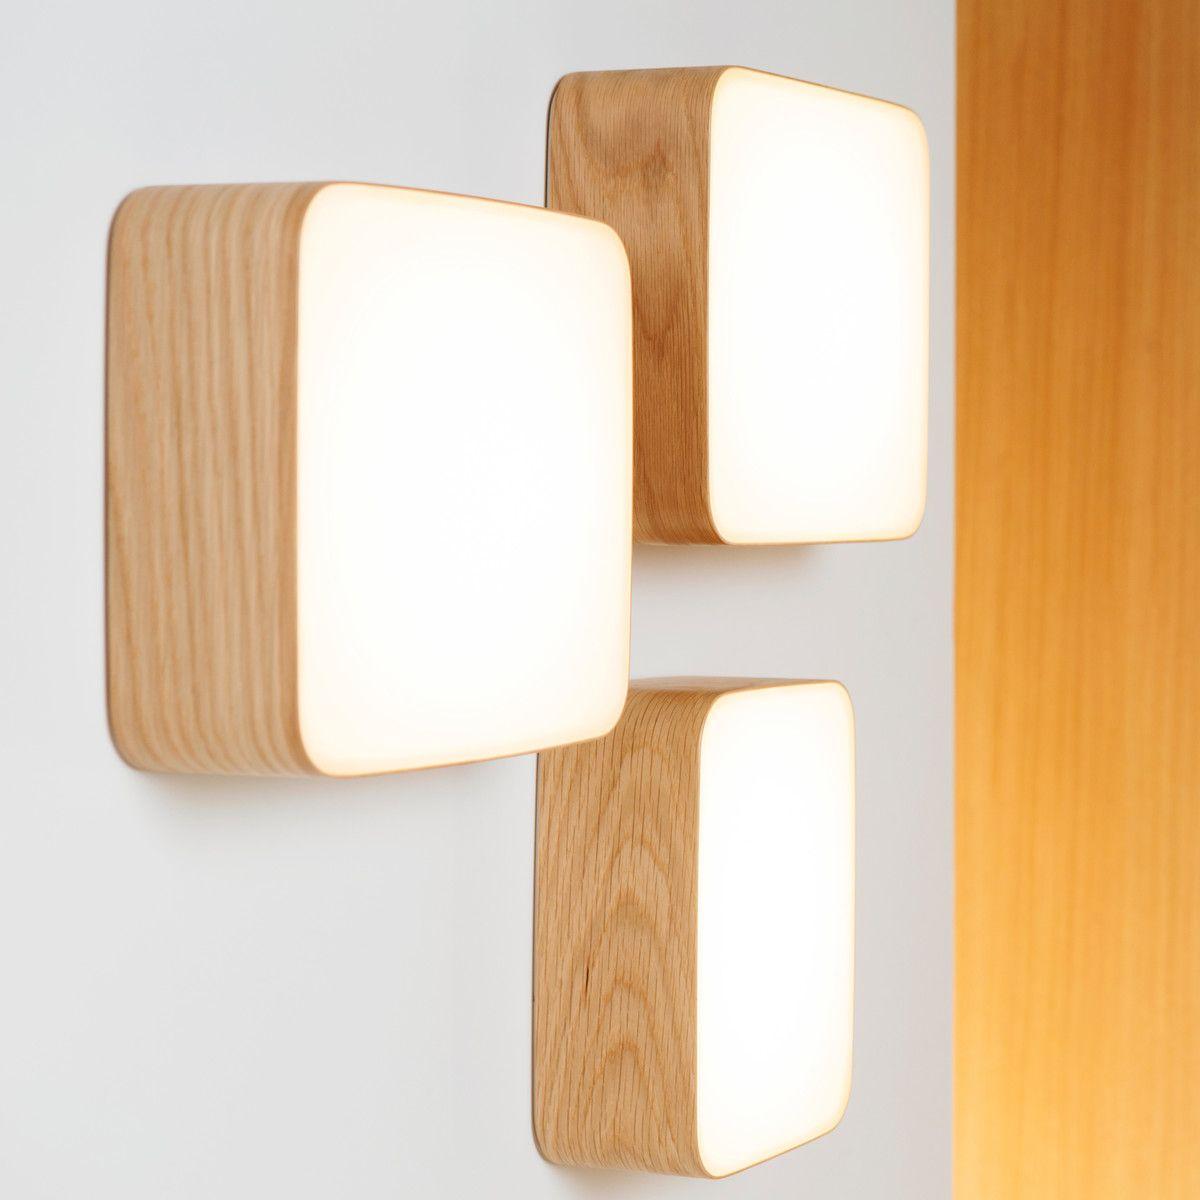 Tunto Cube M Wandleuchte Eichenholz Wandleuchte Wandlampe Lampendesign